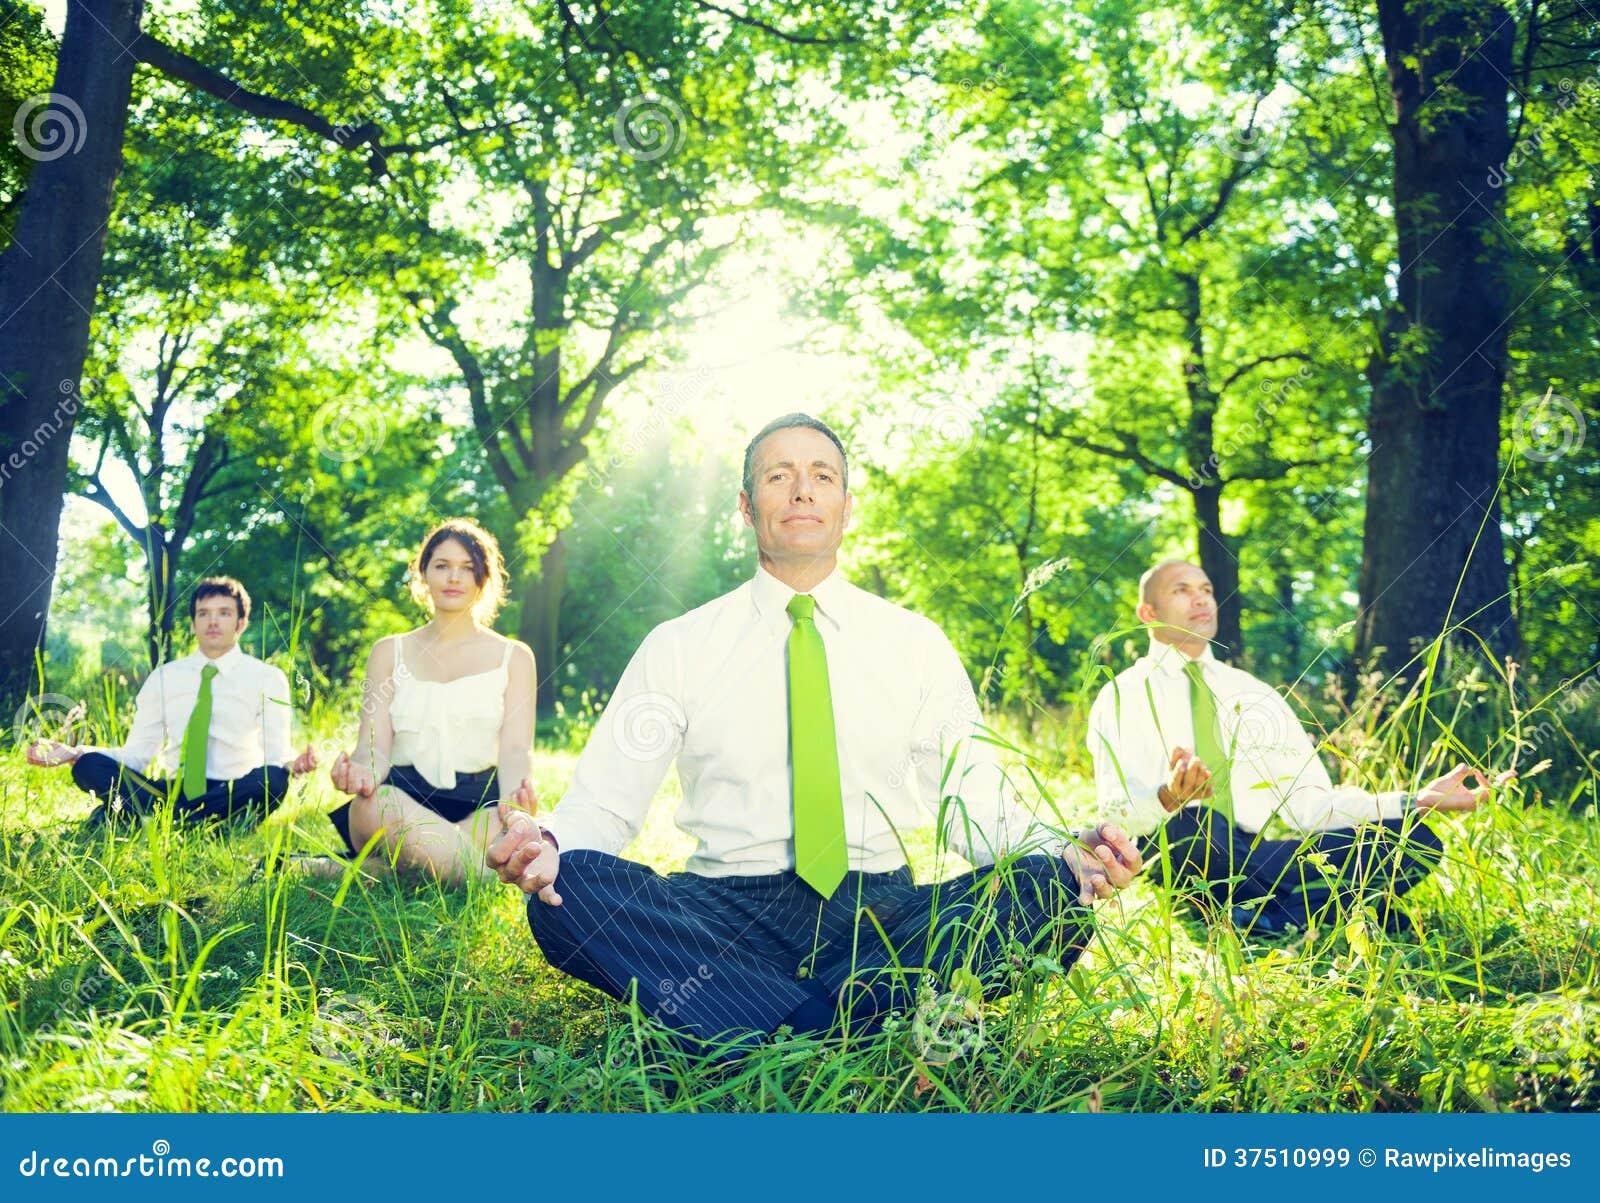 Gruppo di gente di affari verde meditare